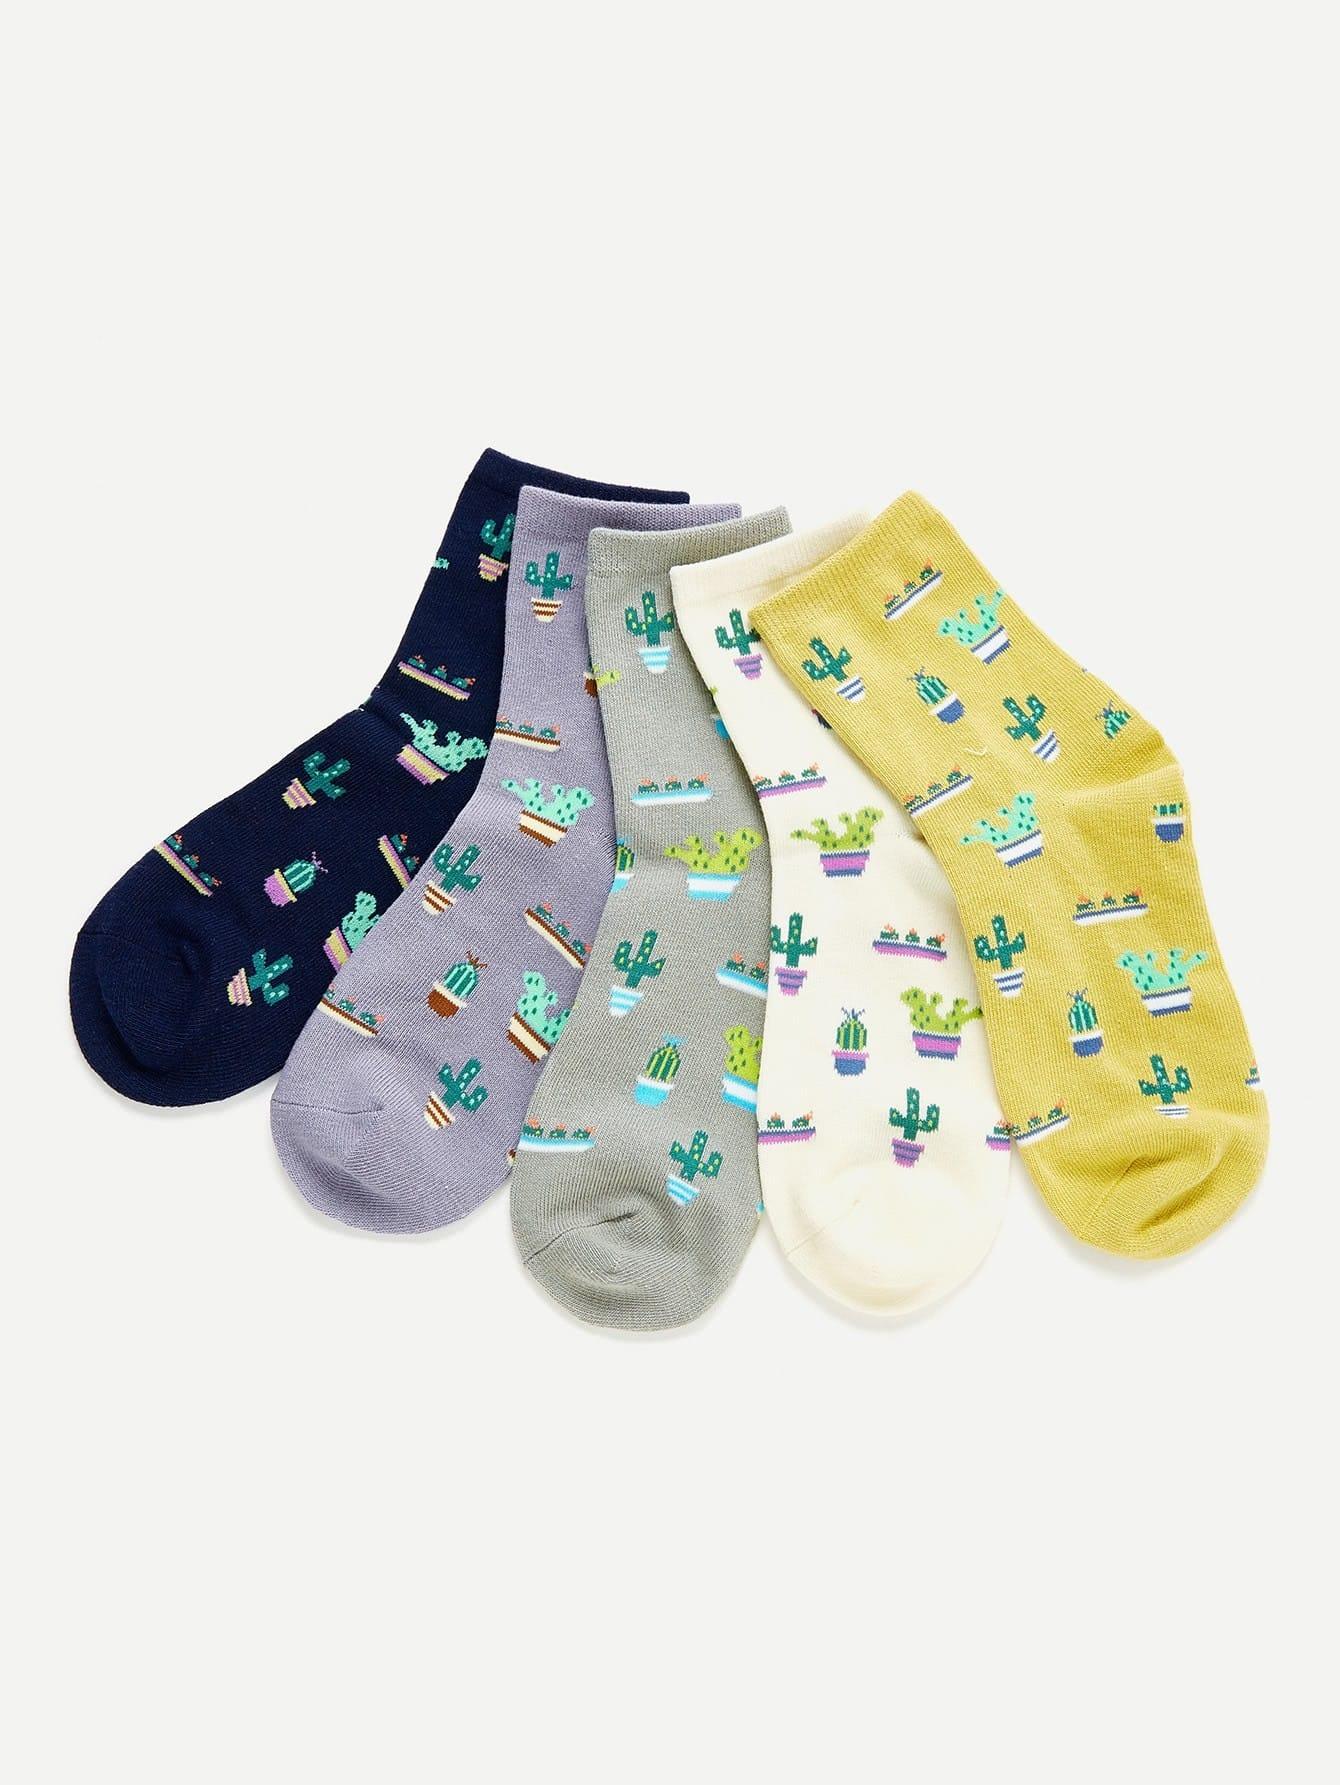 Cactus Print Ankle Socks 5pairs 3d panda baby one side print crazy ankle socks